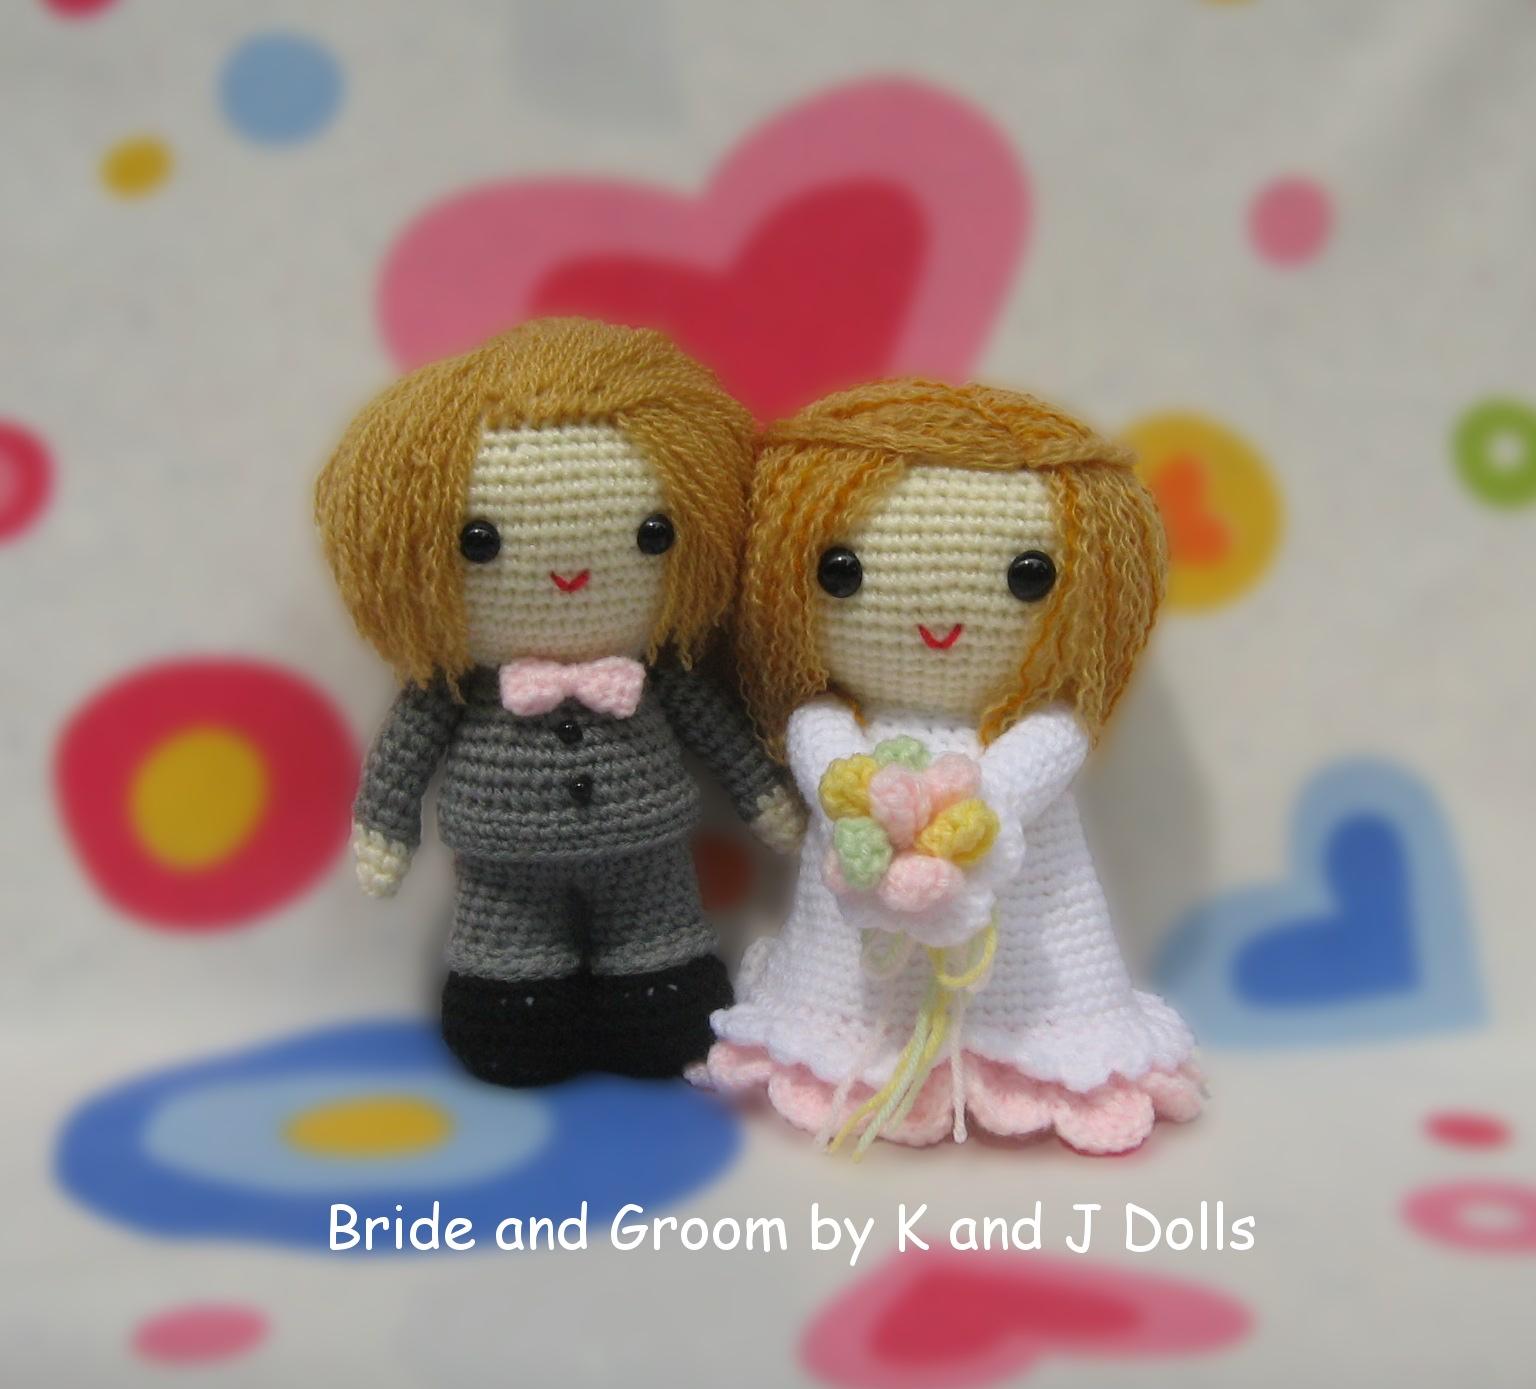 Crochet Pattern Amigurumi Dragon : Bride and Groom bunnies - Sayjai Amigurumi Crochet ...